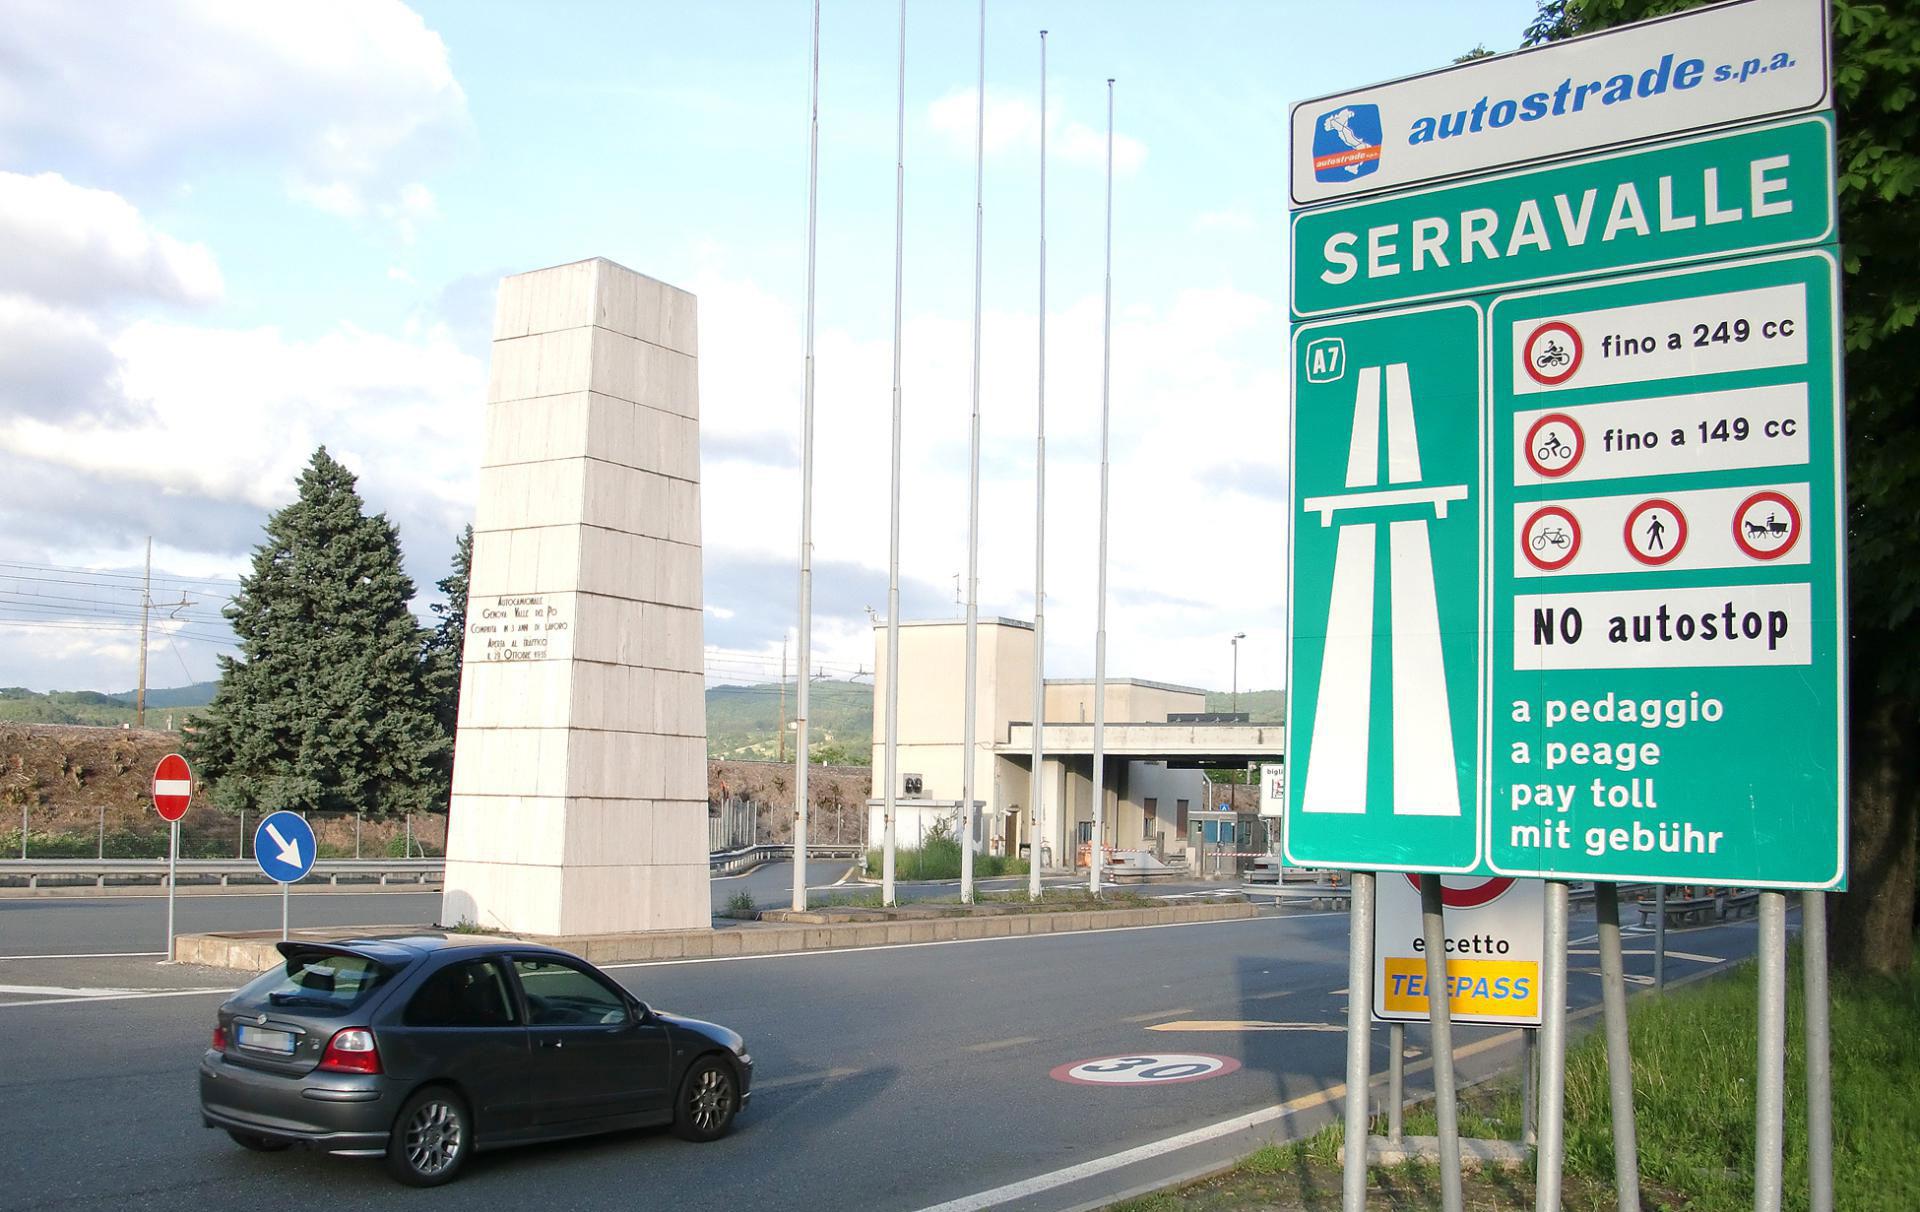 A7 Serravalle ingresso 1920x1200 small